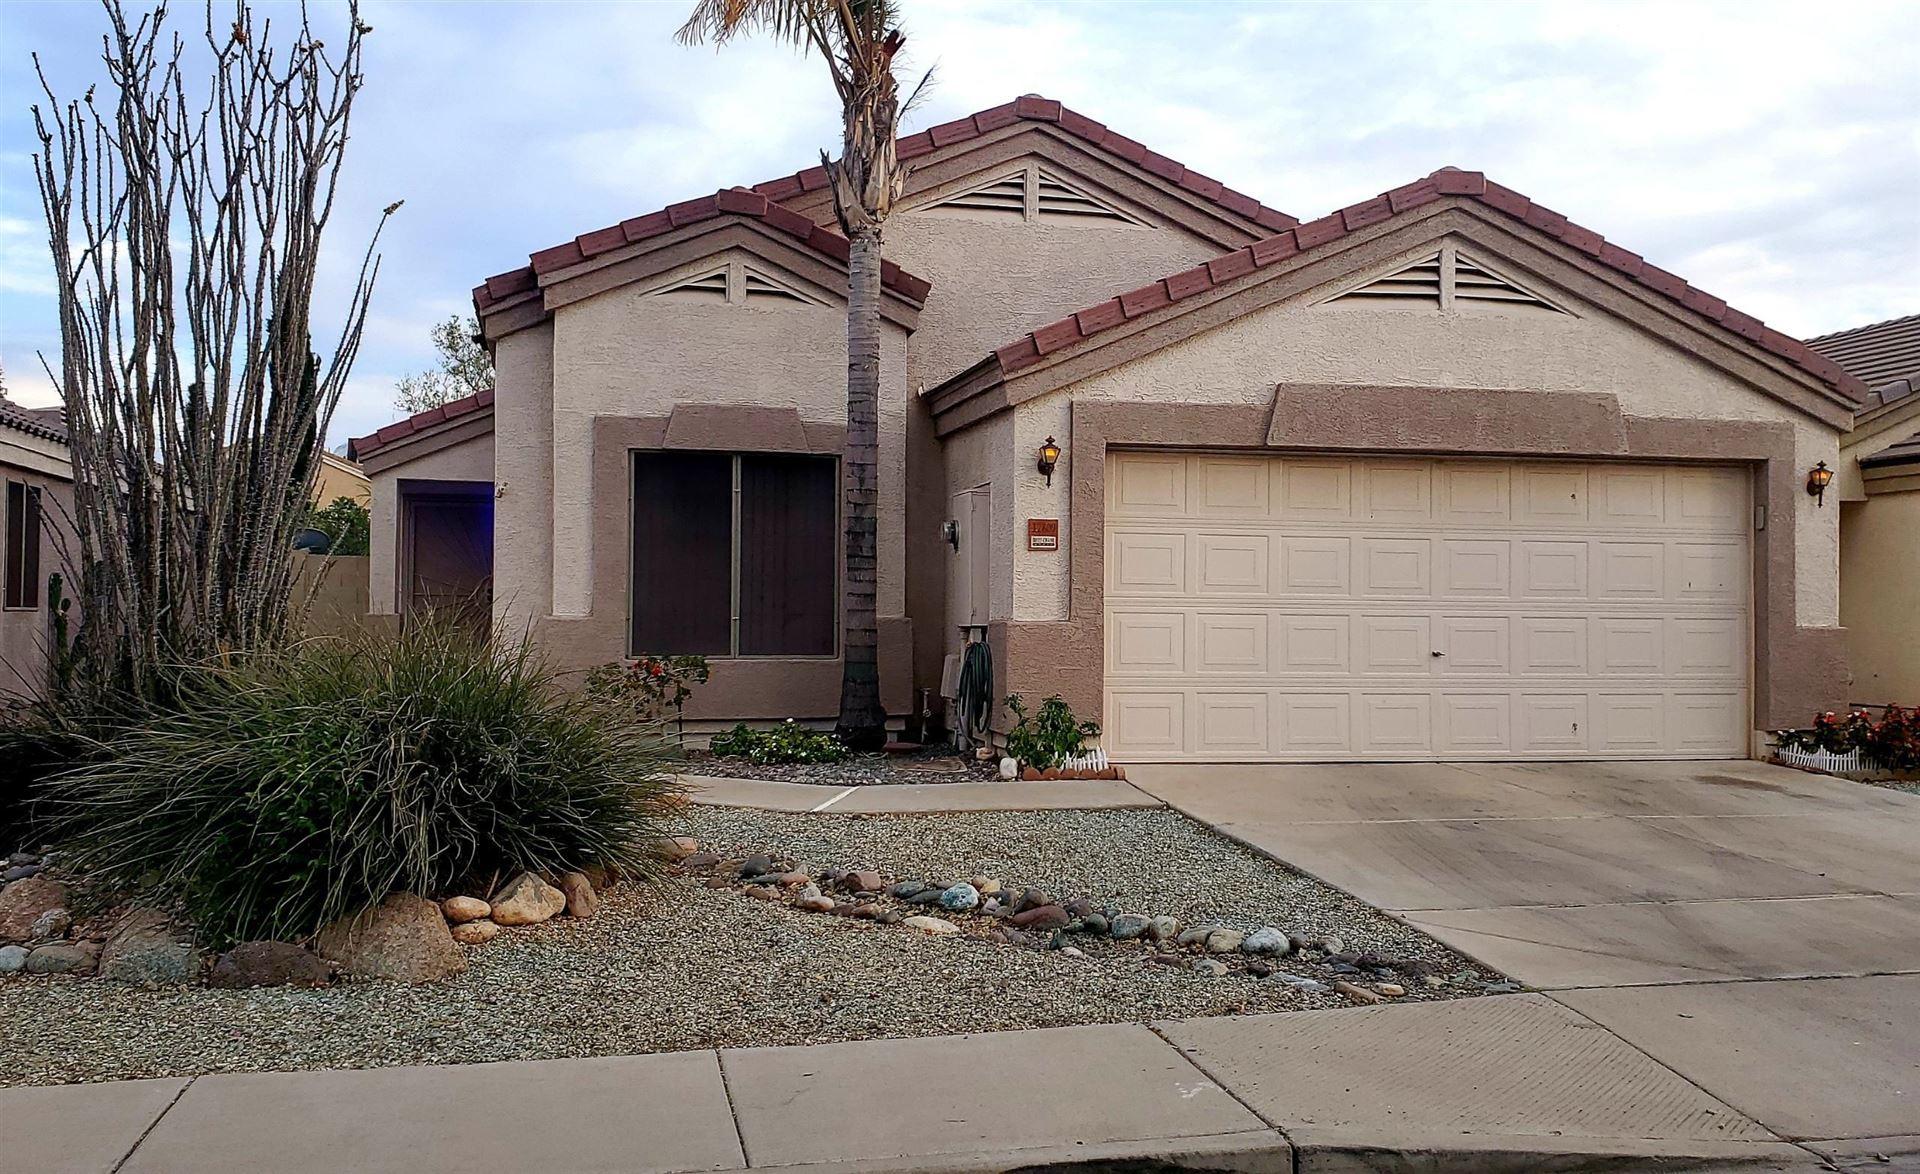 Photo of 12809 W Via Camille Street, El Mirage, AZ 85335 (MLS # 6228309)